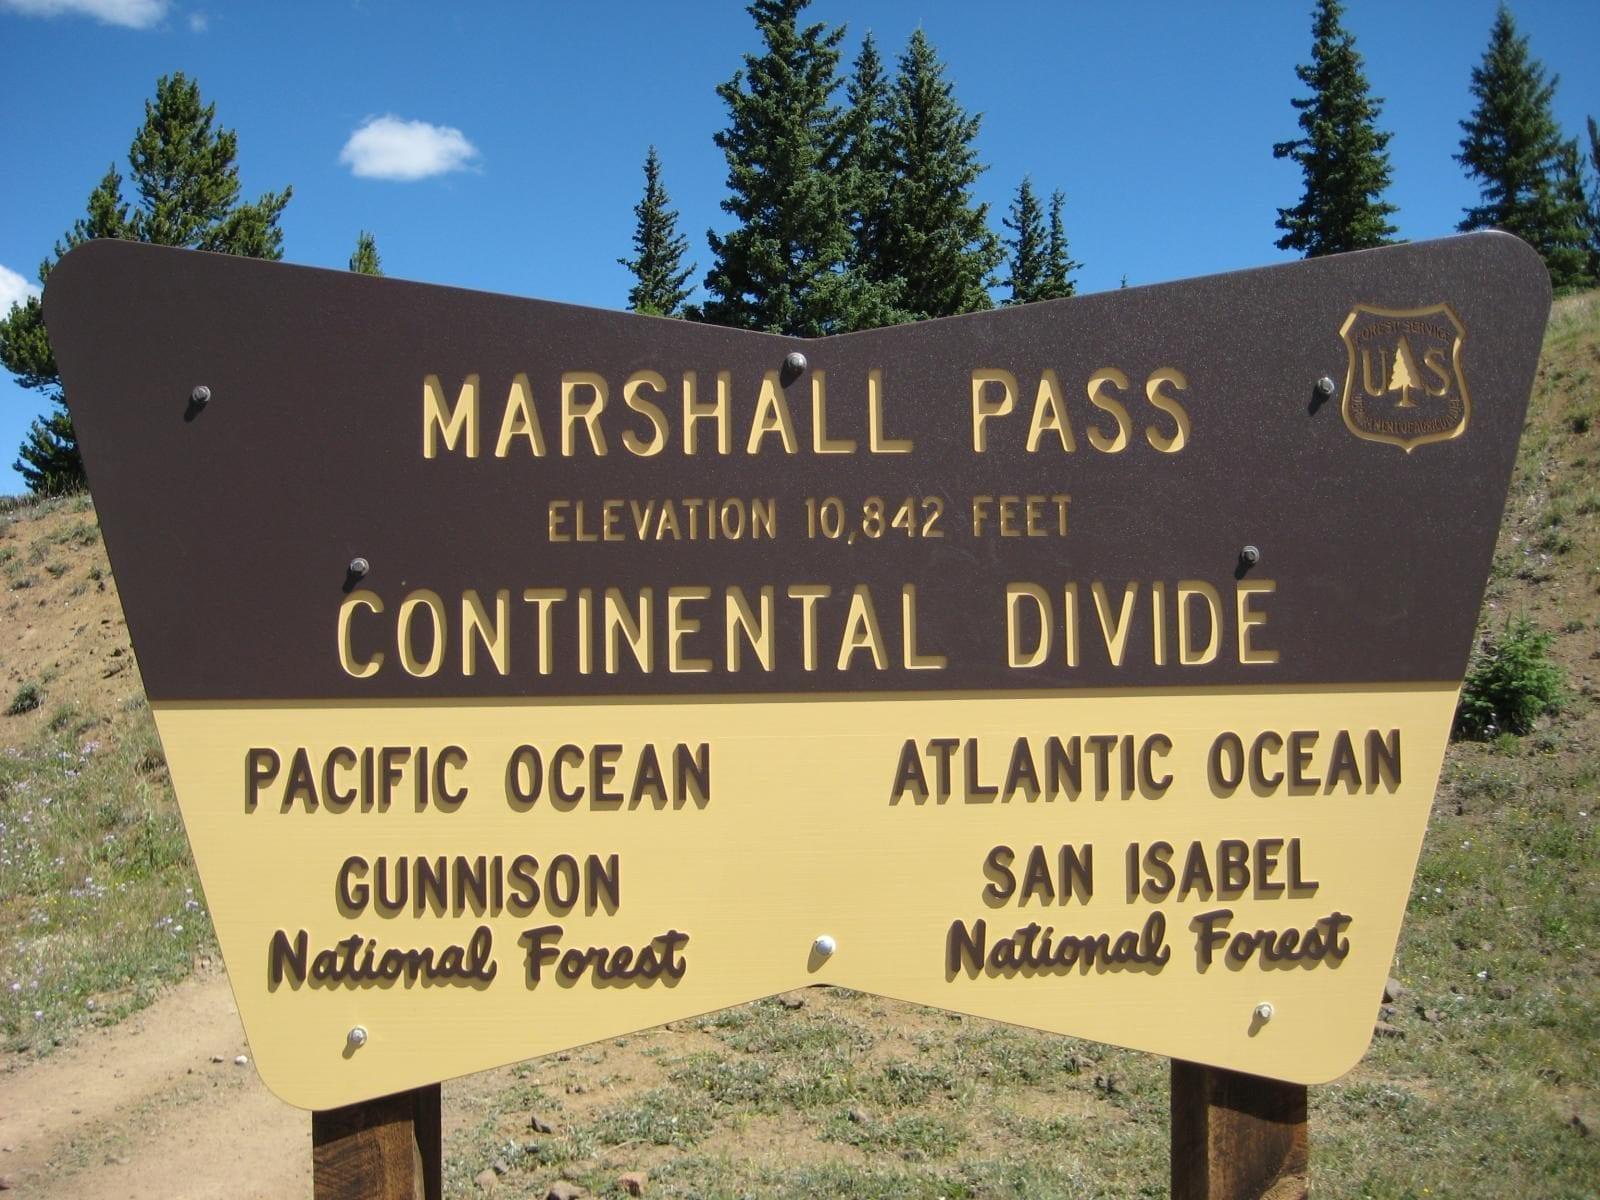 image of marshall pass